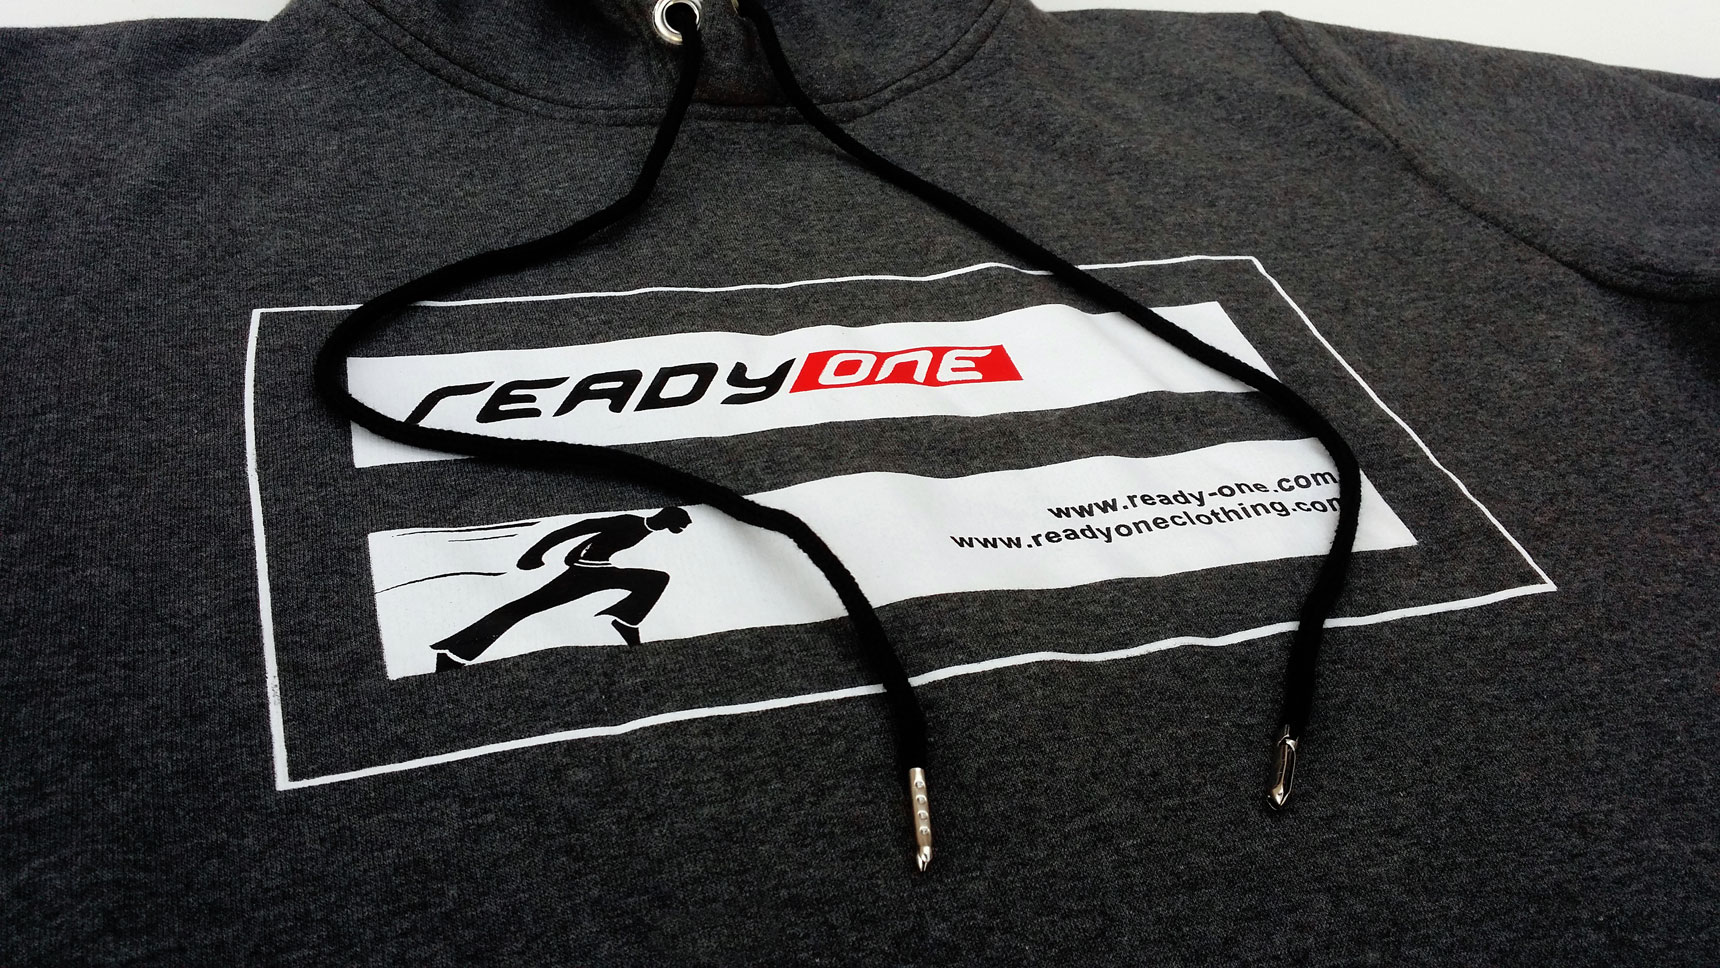 hoodies-sweatshirts-ready-one-clothing